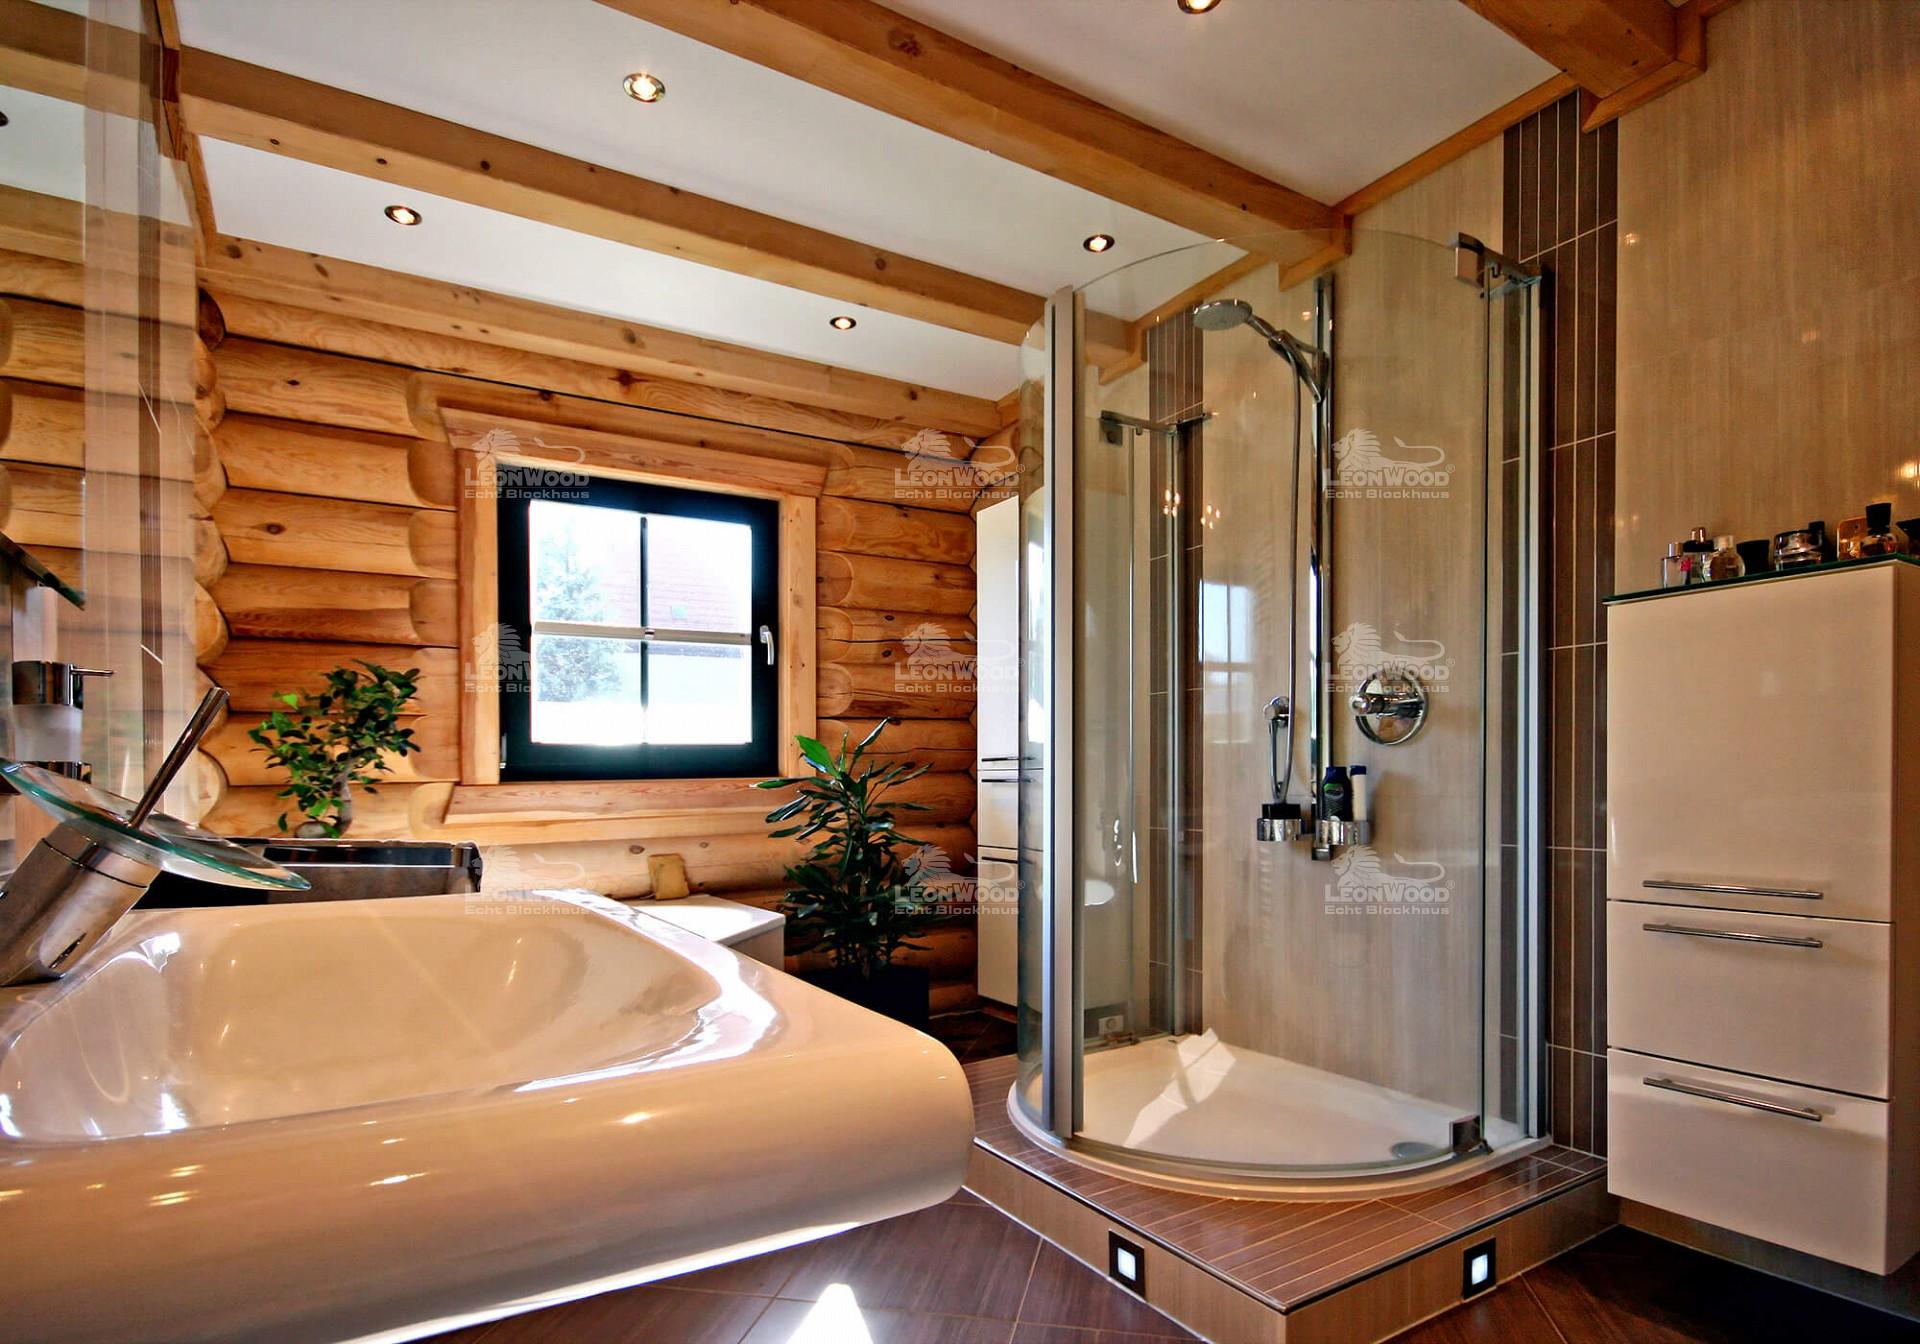 detailseite blockhaus l onwood. Black Bedroom Furniture Sets. Home Design Ideas